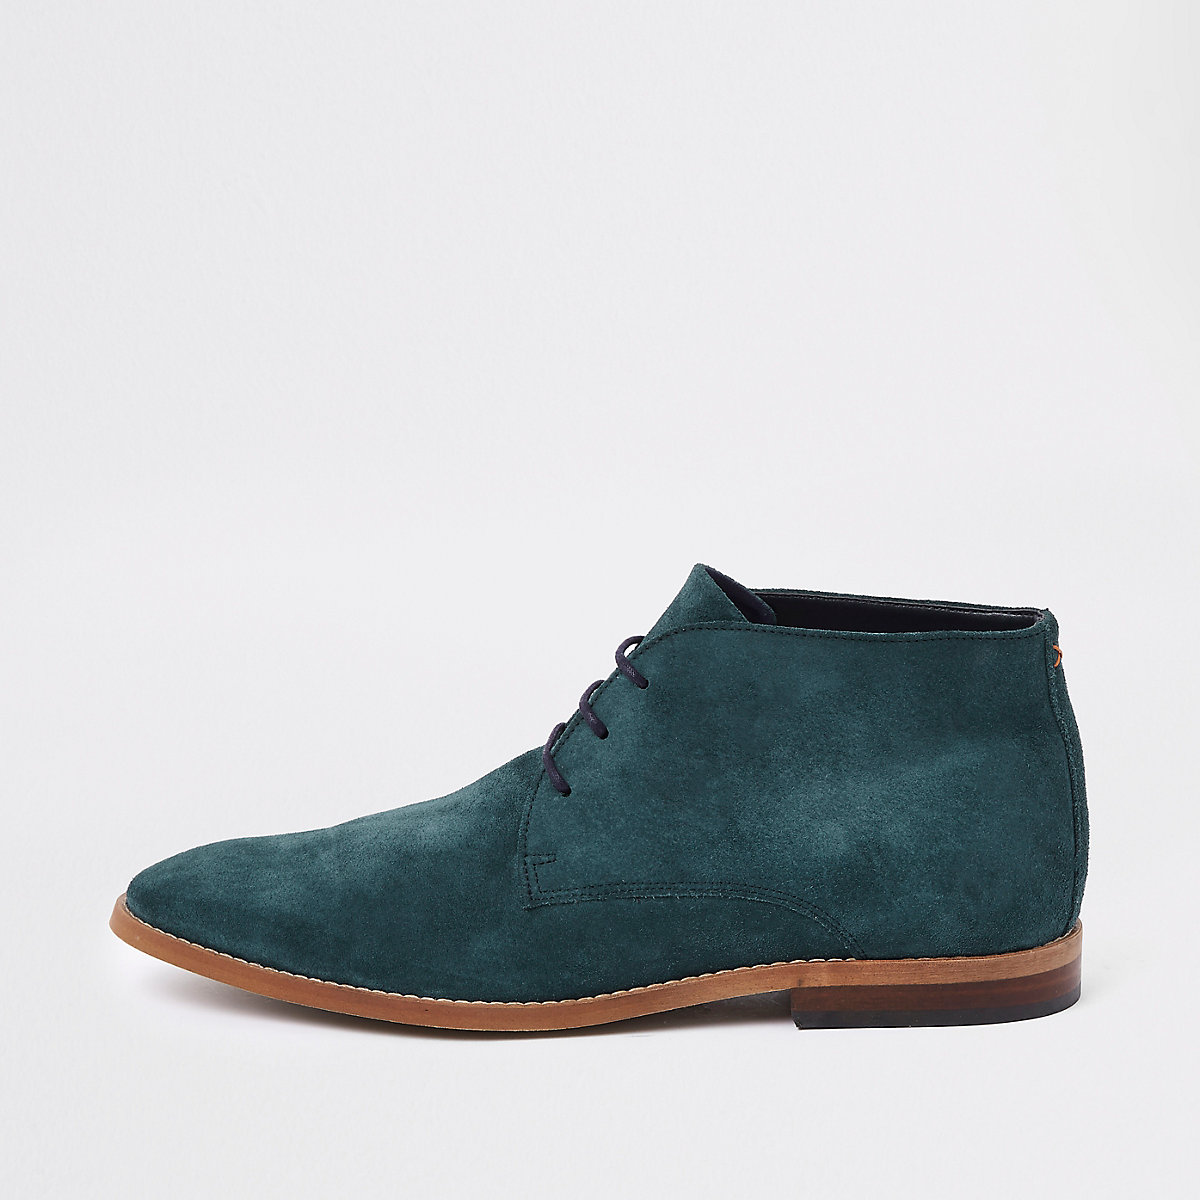 Teal blue suede desert boots